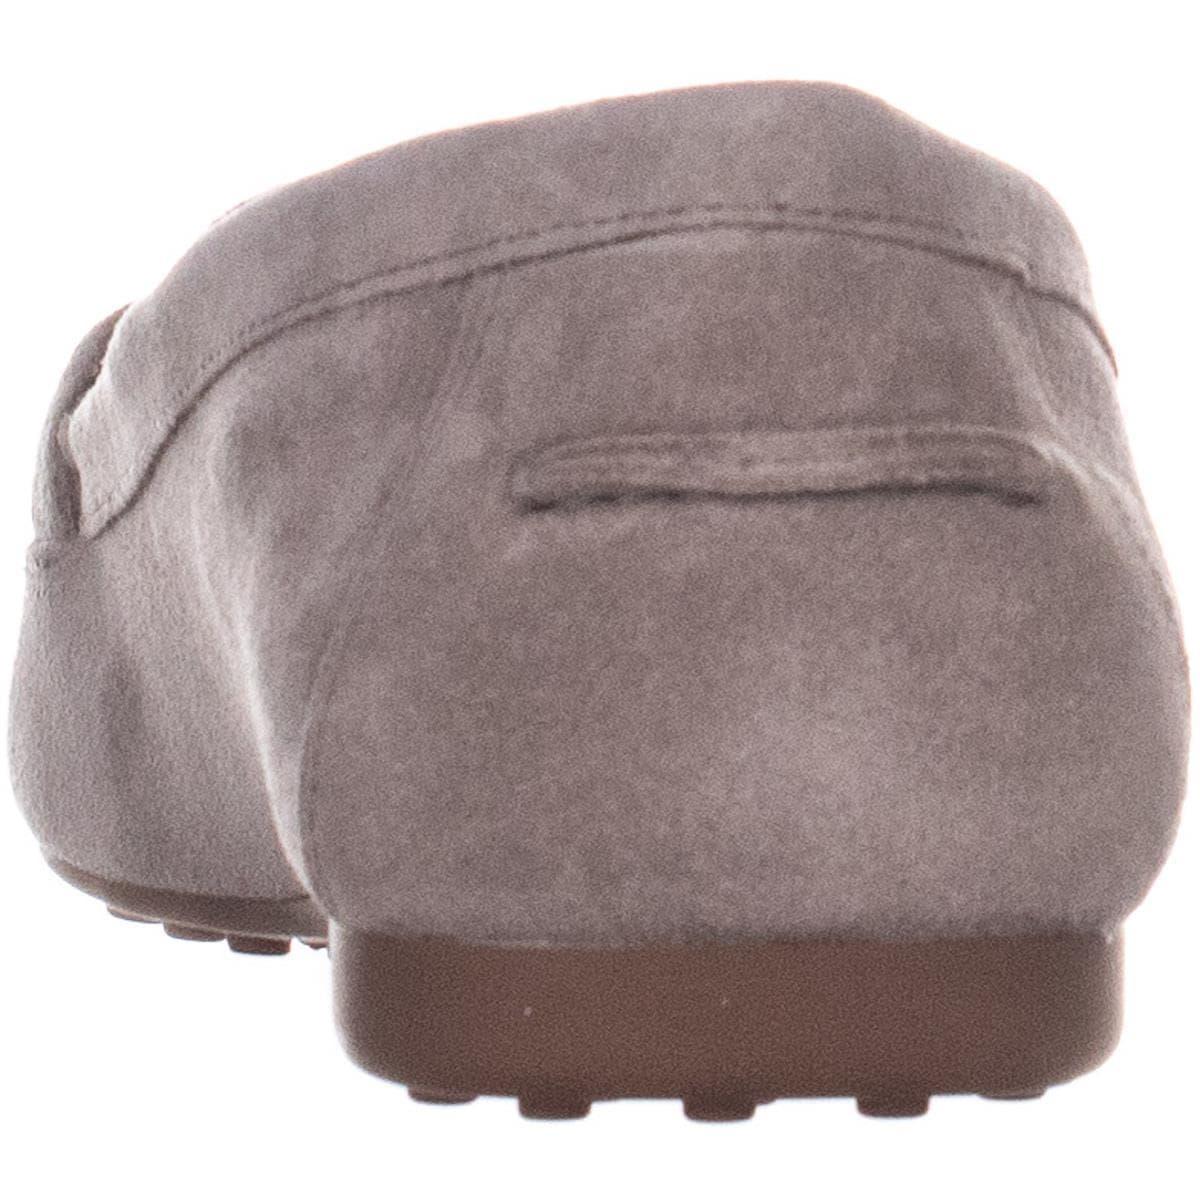 b734447dbb8 Shop Kate Spade New York Carson Slip On Loafers